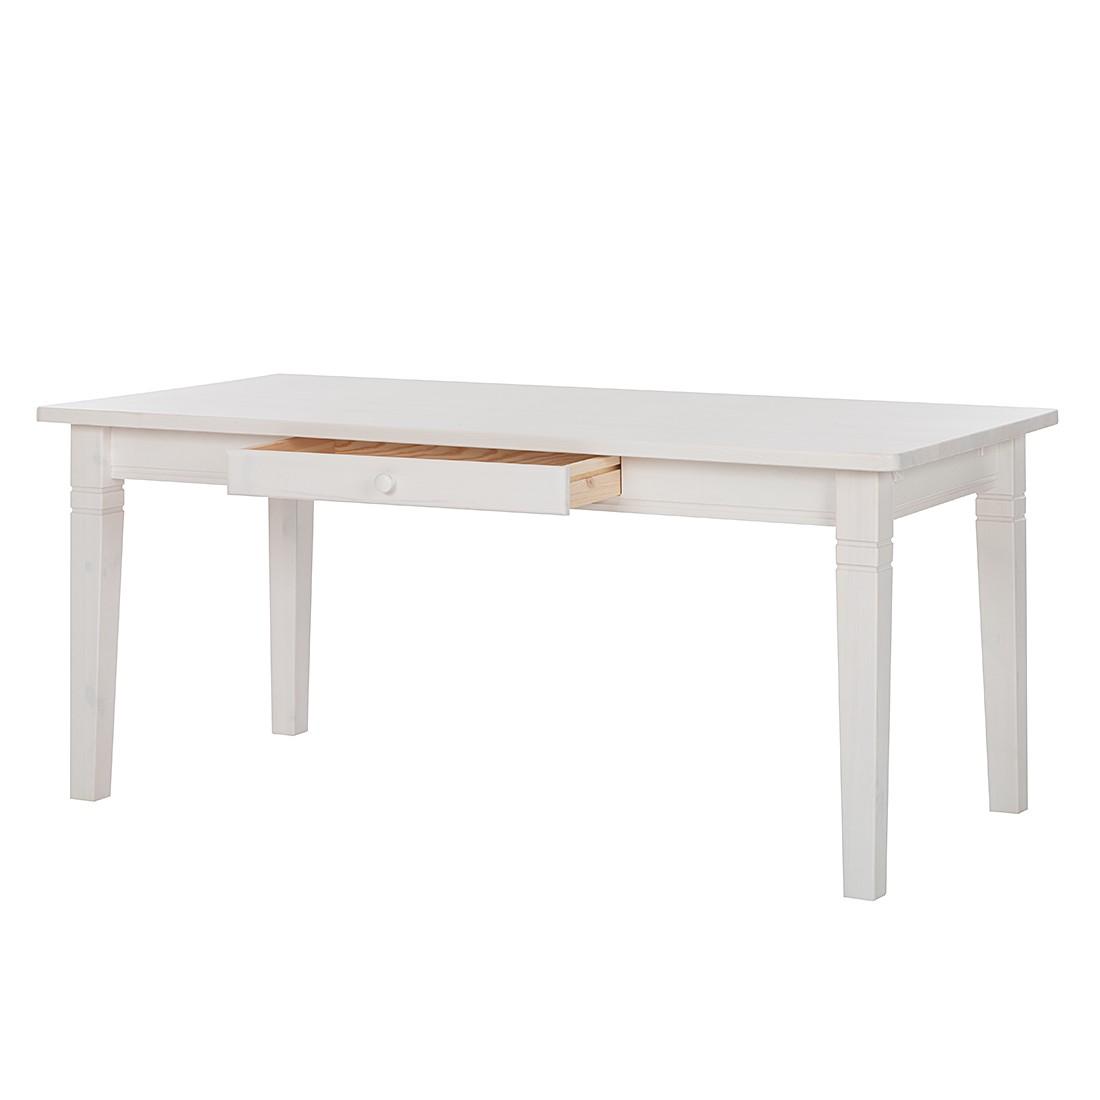 ... Kiefer massiv - Weiß - 180 x 90 cm - Ohne Funktion, Landhaus Classic